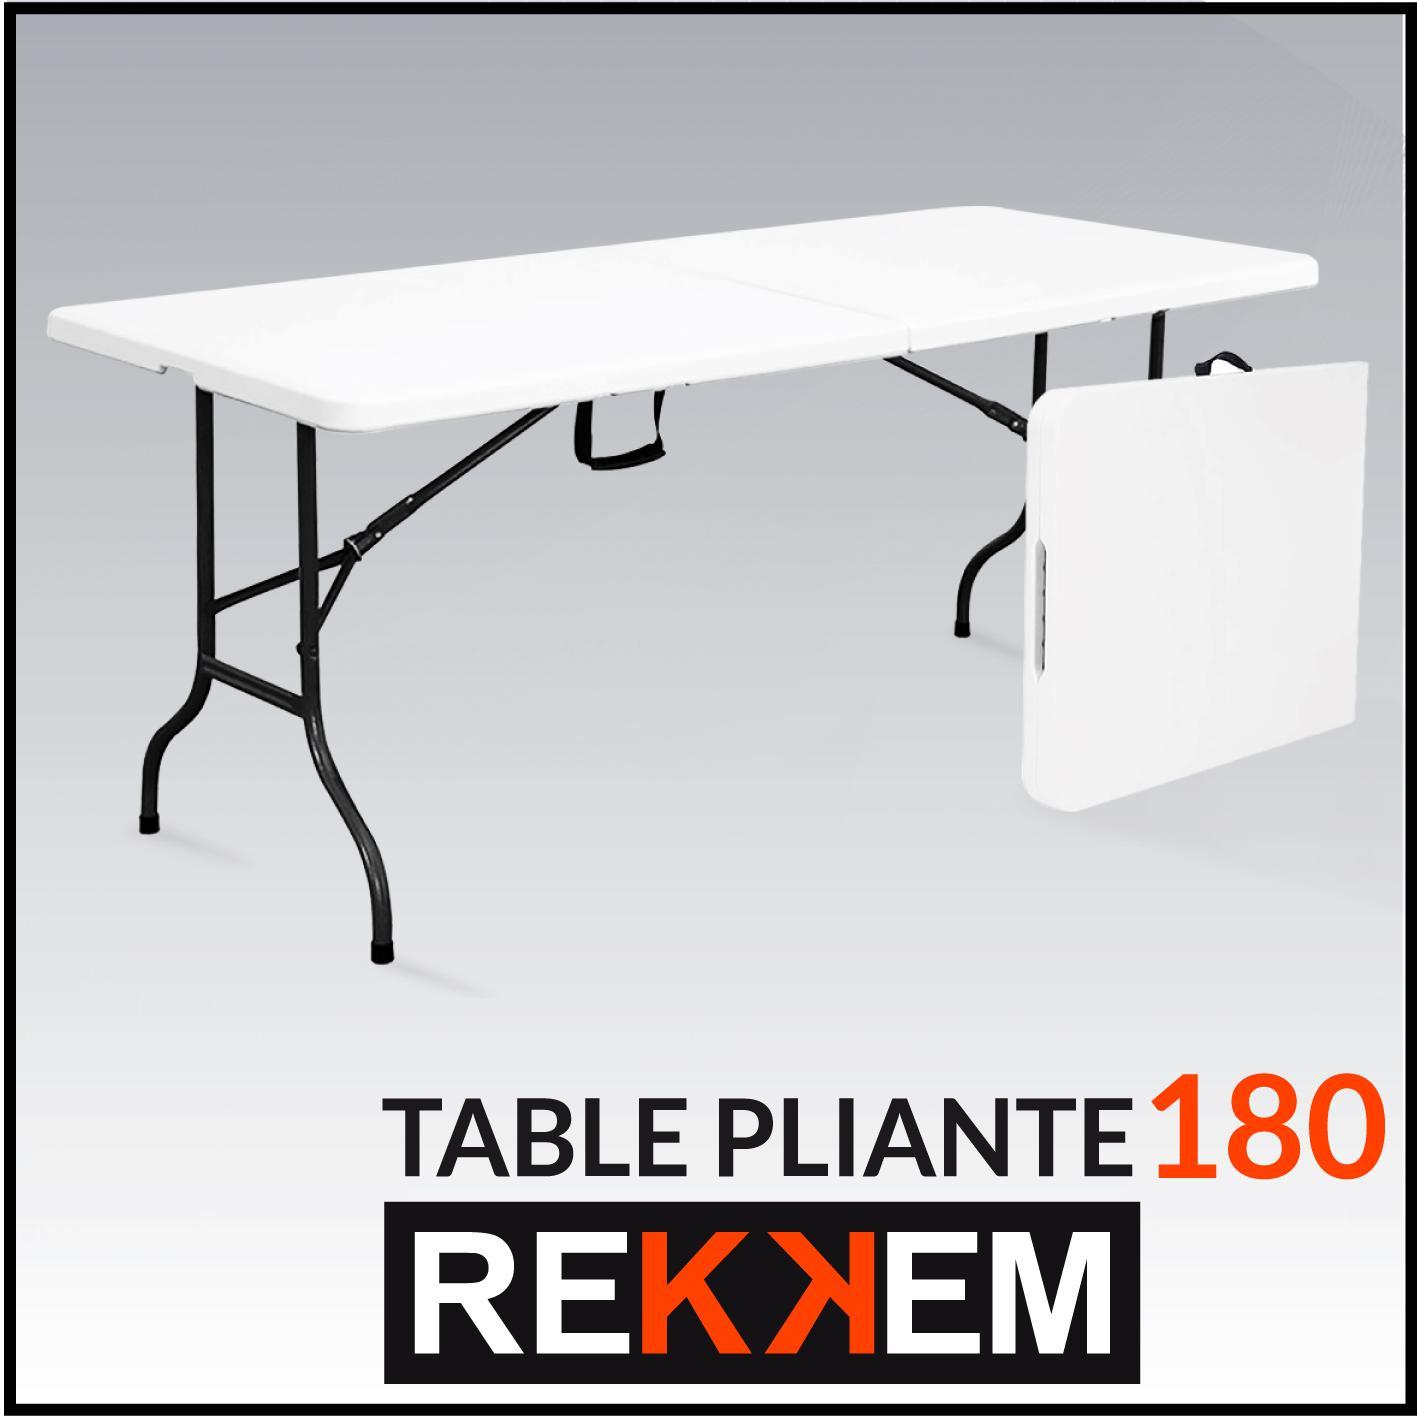 rekkem table pliante blanc noir 180 x 75 x 74 cm 101587 jardin. Black Bedroom Furniture Sets. Home Design Ideas